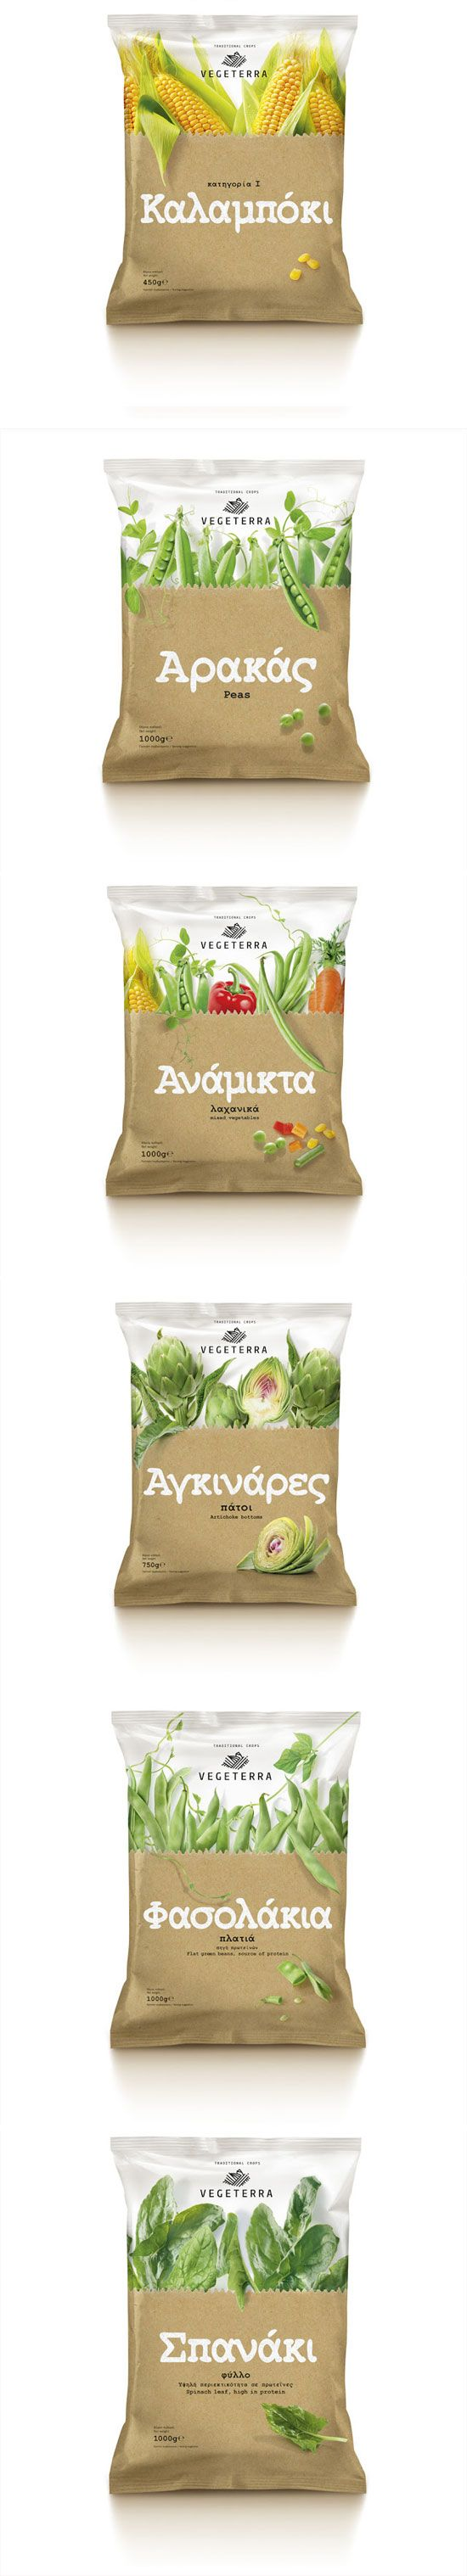 Food Packaging: Vegeterra Frozen Vegetables